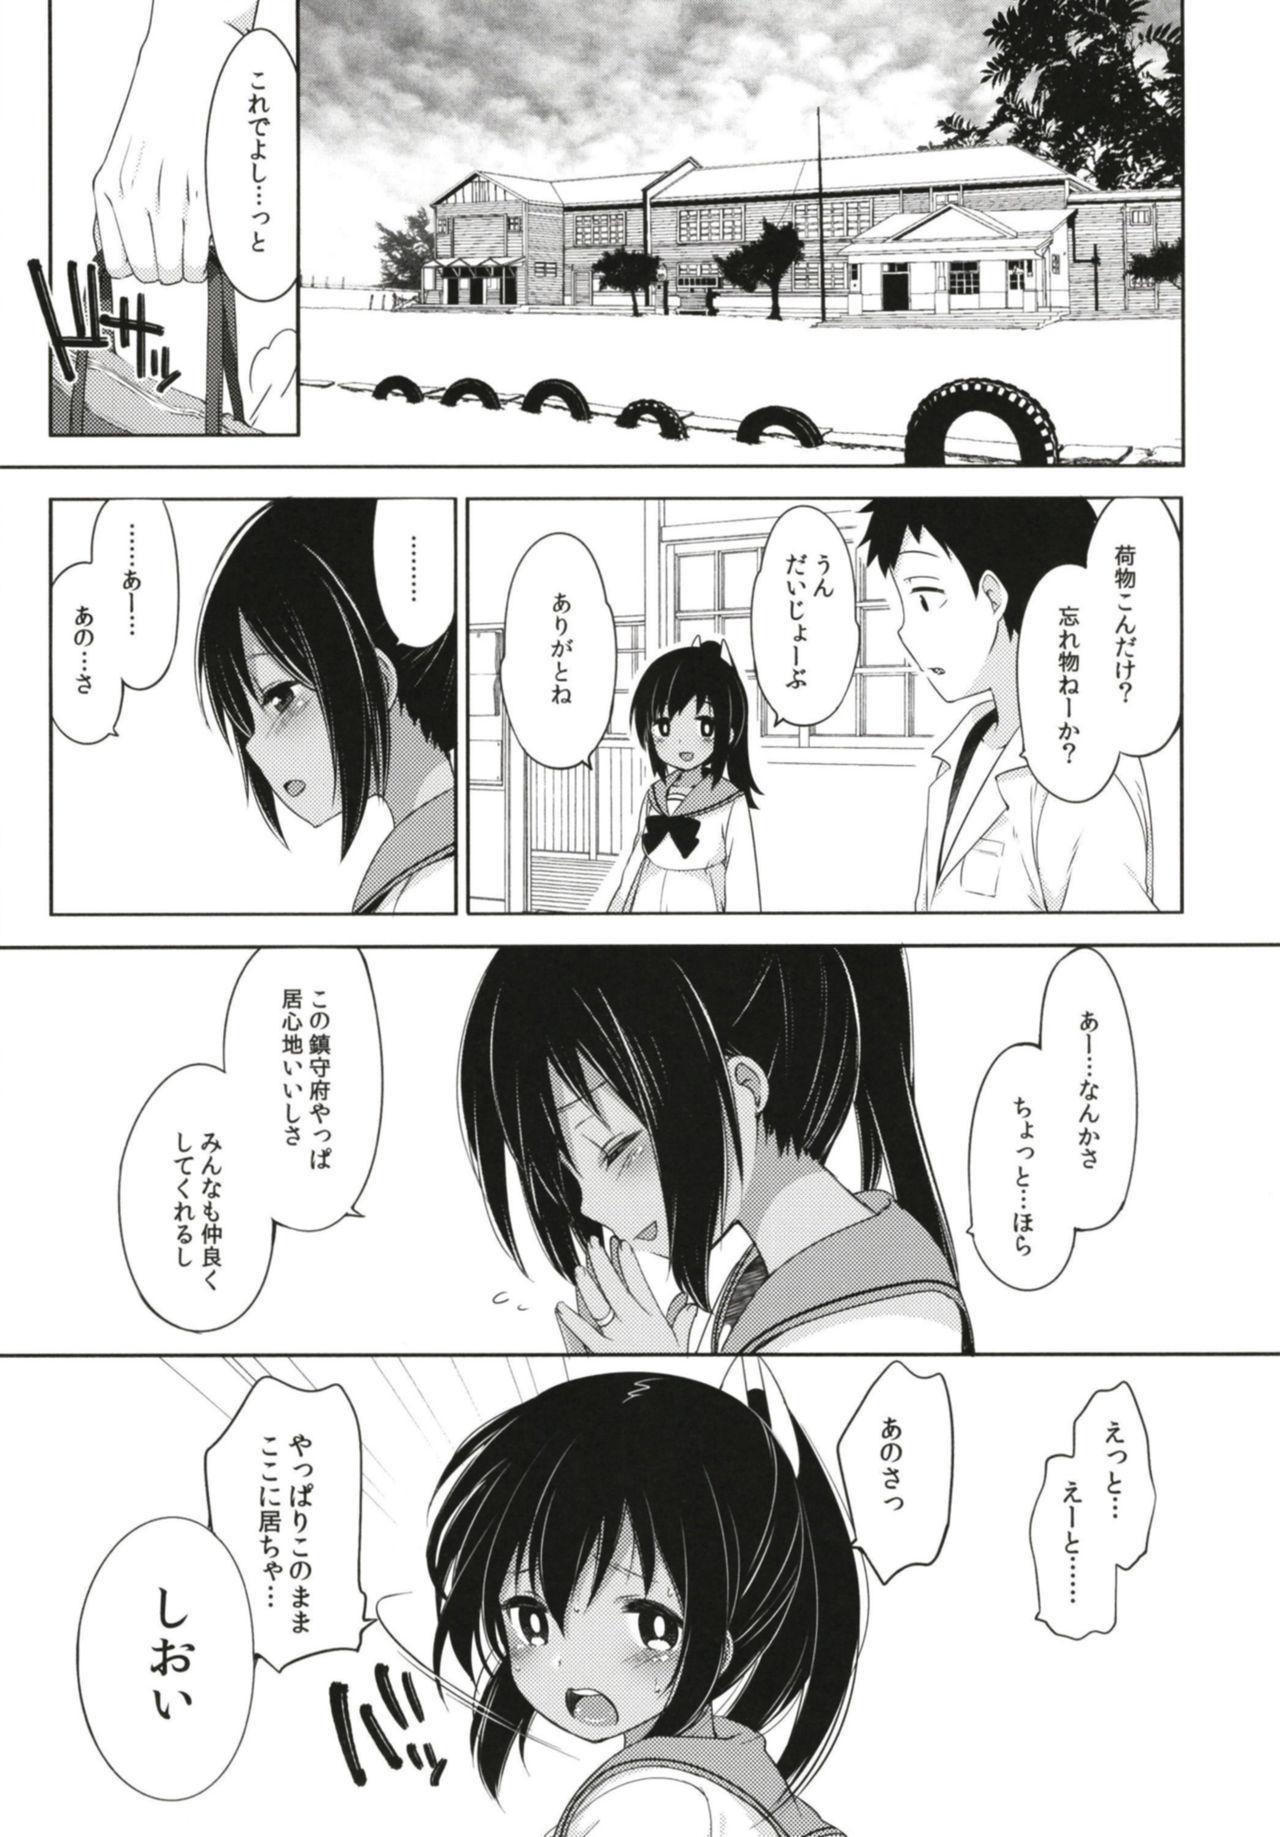 [French letter (Fujisaki Hikari)] Hitonatsu no Ayamachi -I-401 Soushuuhen- (Kantai Collection -KanColle-) [Digital] 82